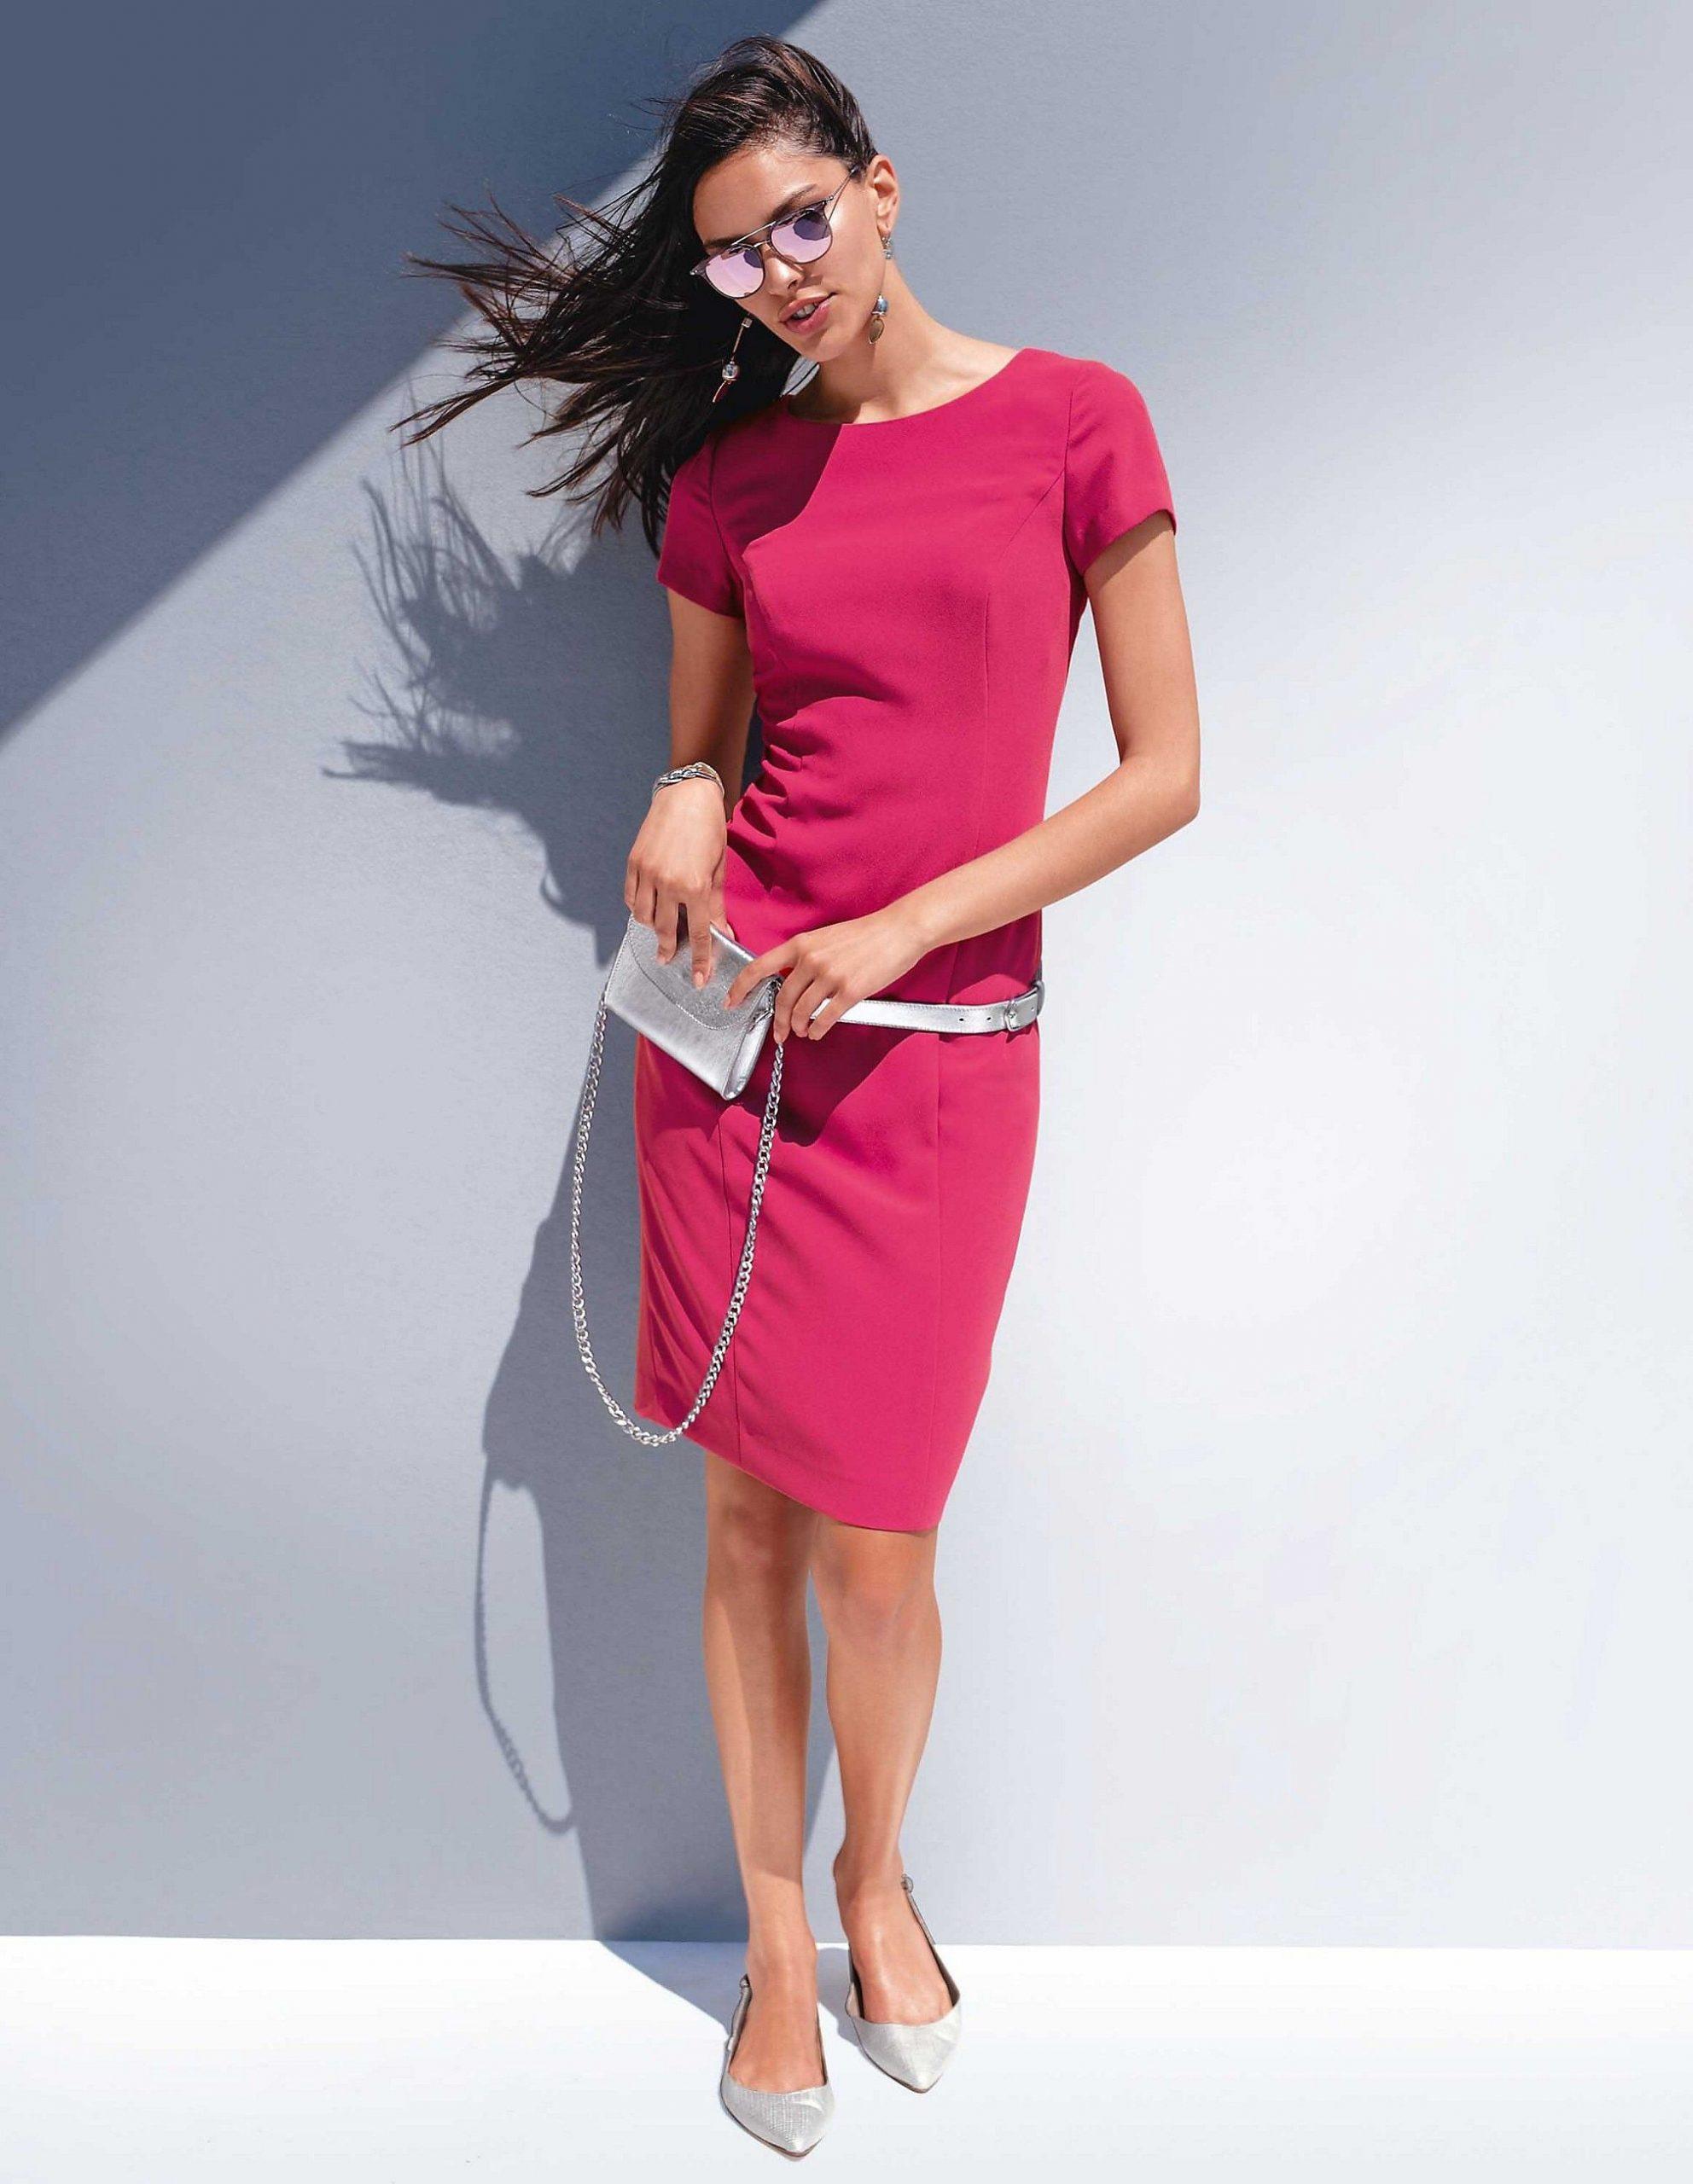 Etuikleid Mit Halbarm, Erdbeerpink, Pink  Madeleine Mode - Abendkleid